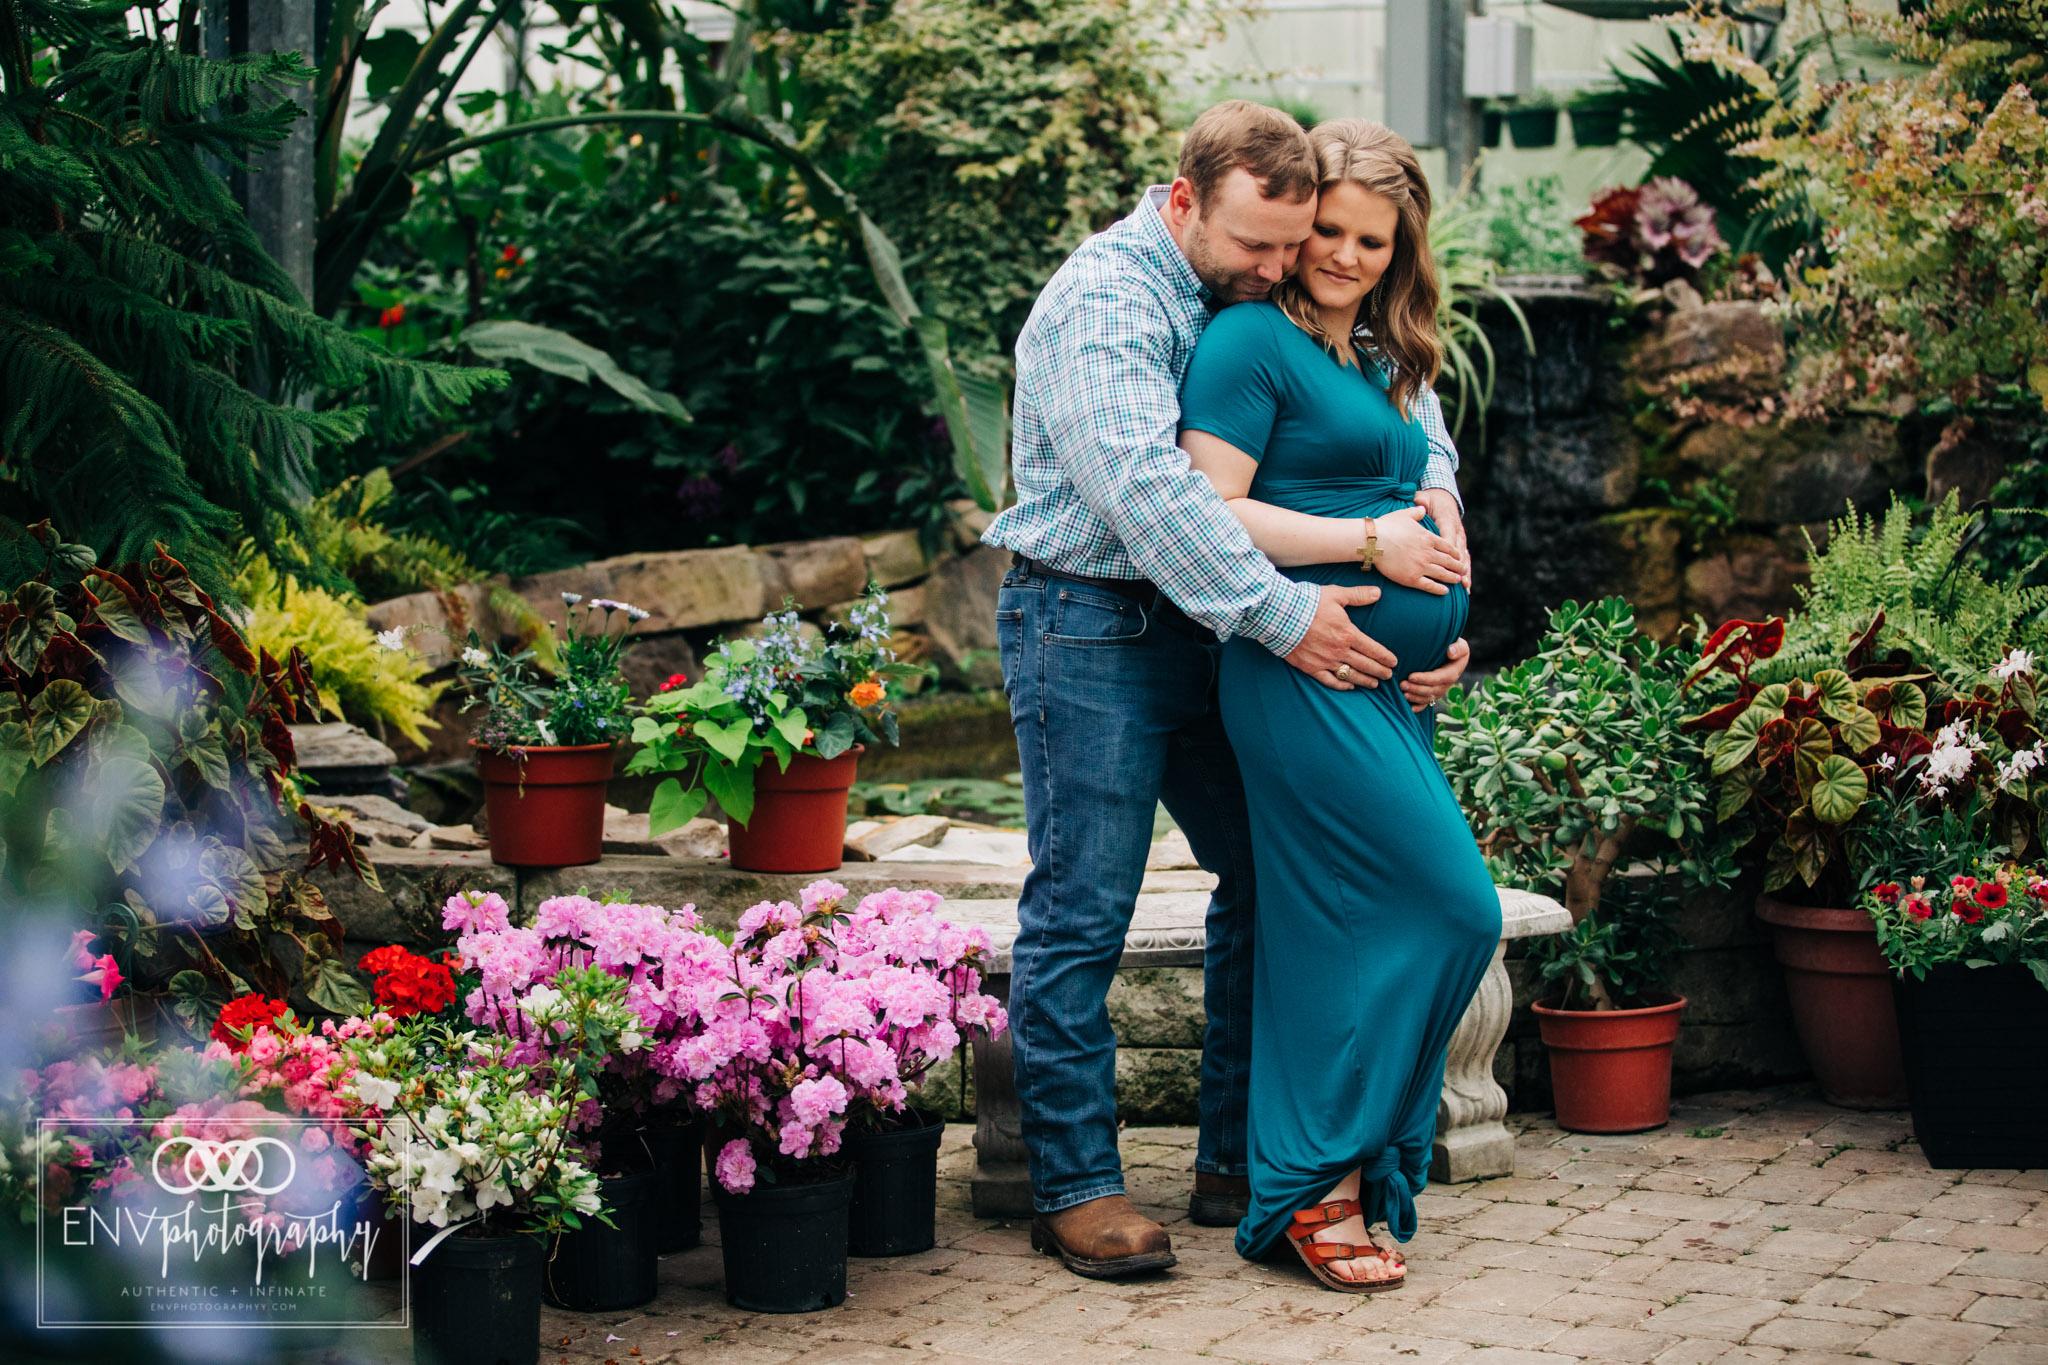 mount vernon columbus mansfield ohio maternity newborn photographer mohican gardens (13).jpg